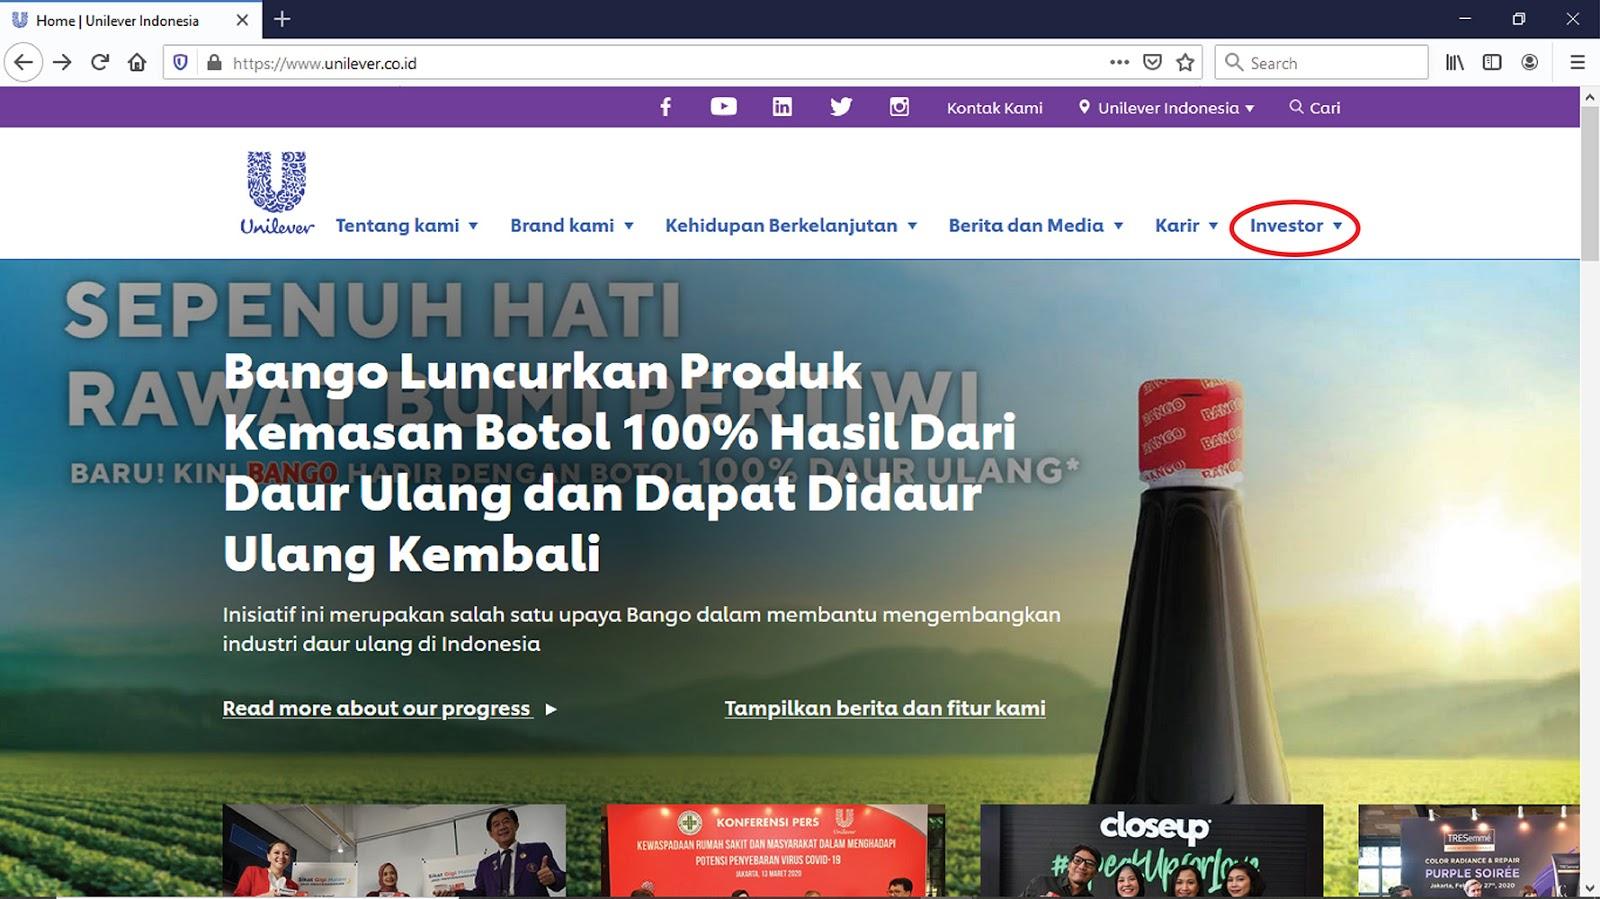 Rudy Hizkia Cara Mudah Membaca Laporan Keuangan Perusahaan